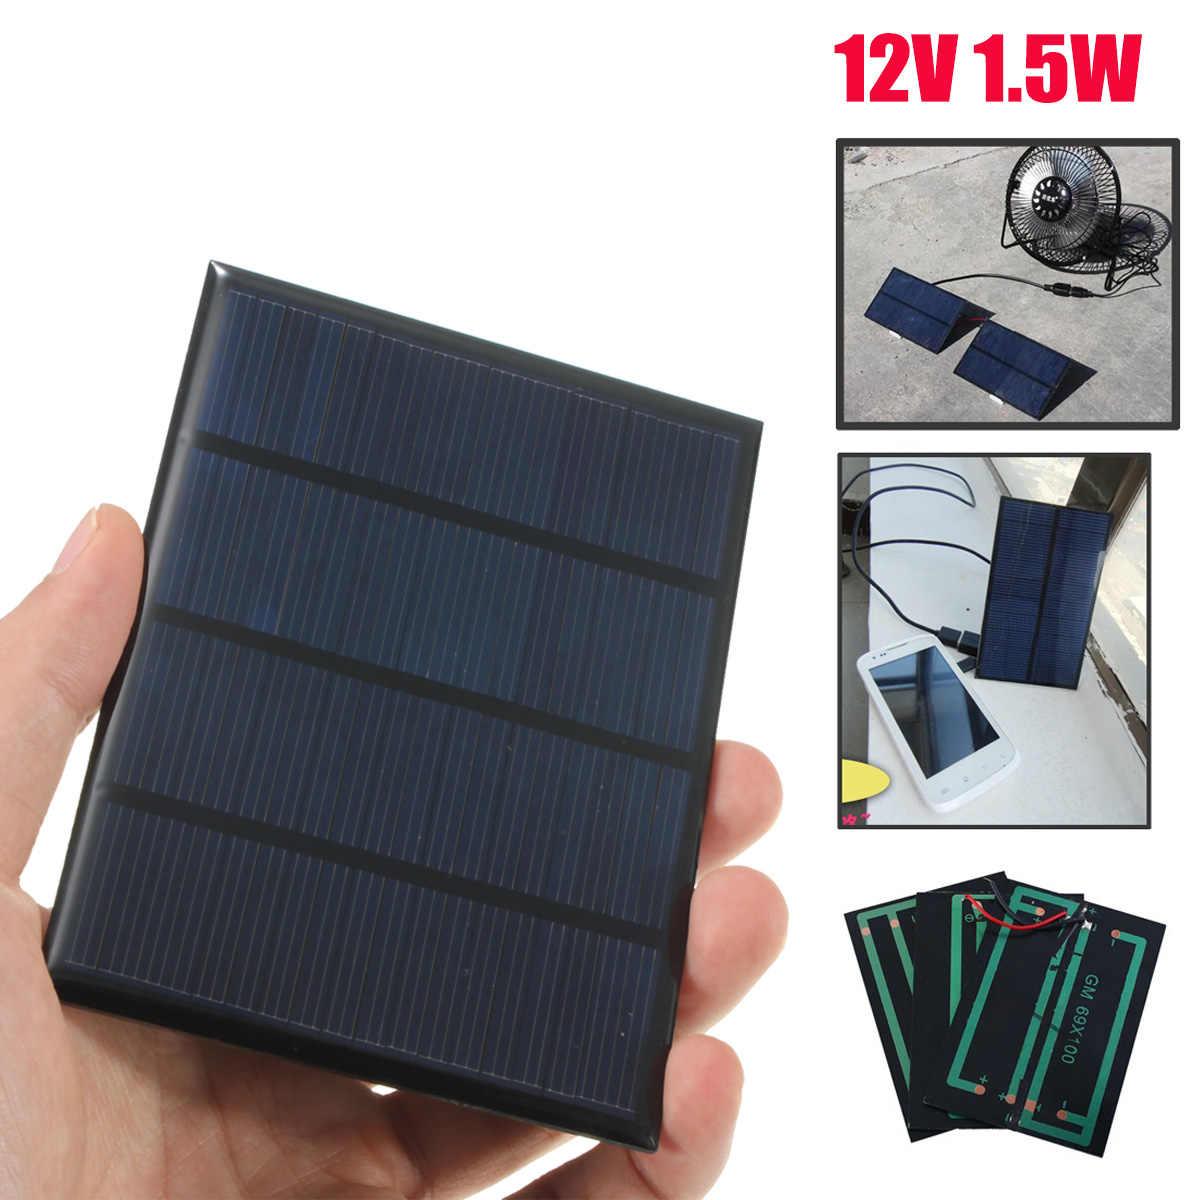 Claite 12 v 1.5 ワットミニ多結晶ソーラーパネルエポキシ太陽電池シリコン diy バッテリーパワーバンク充電器ソーラーモジュールシステム